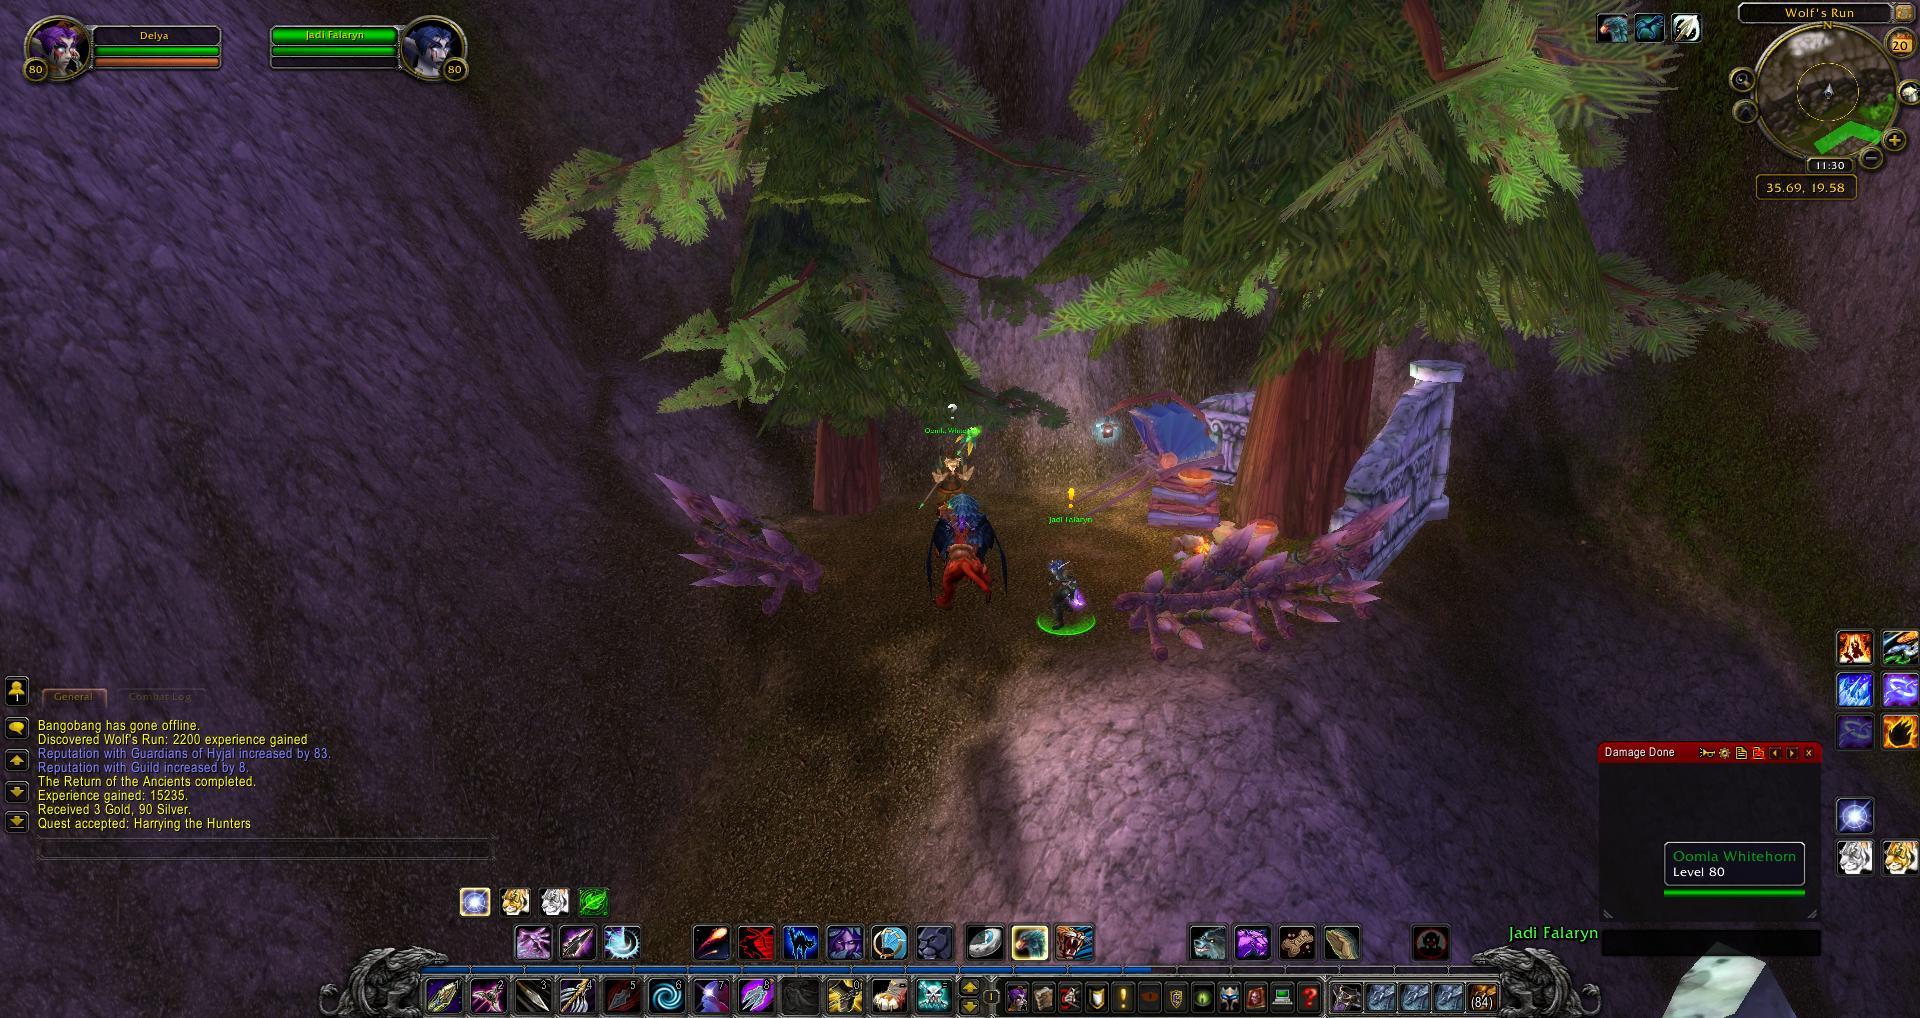 Wolfs Run Mount Hyjal Wow Screenshot Gamingcfgcom